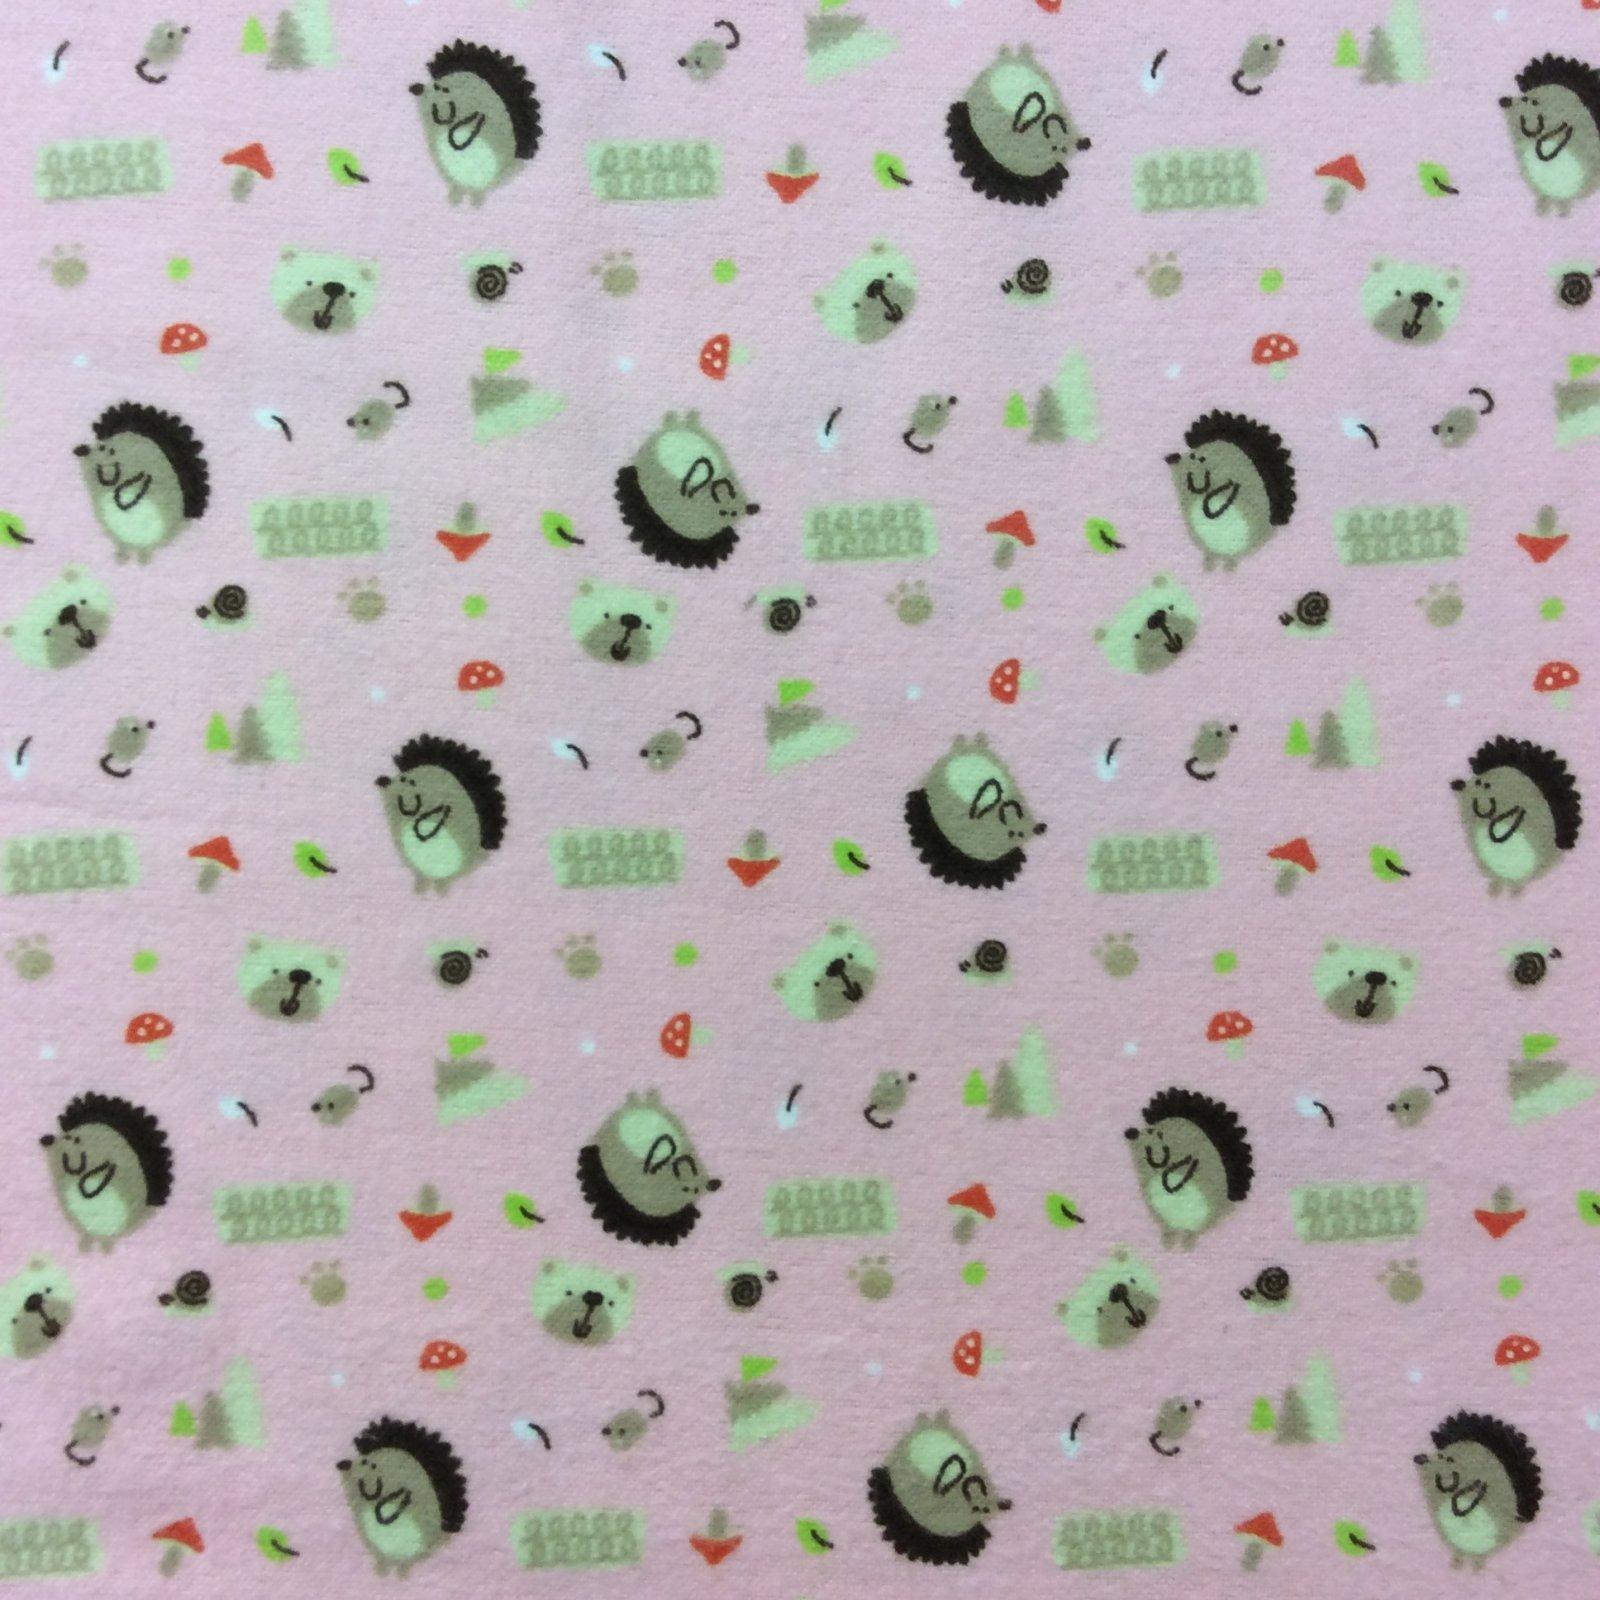 AA01 Hedgehog Cute Japanese Style Hedgehogs Mushrooms Mini Print Cotton Fabric Soft Flannel